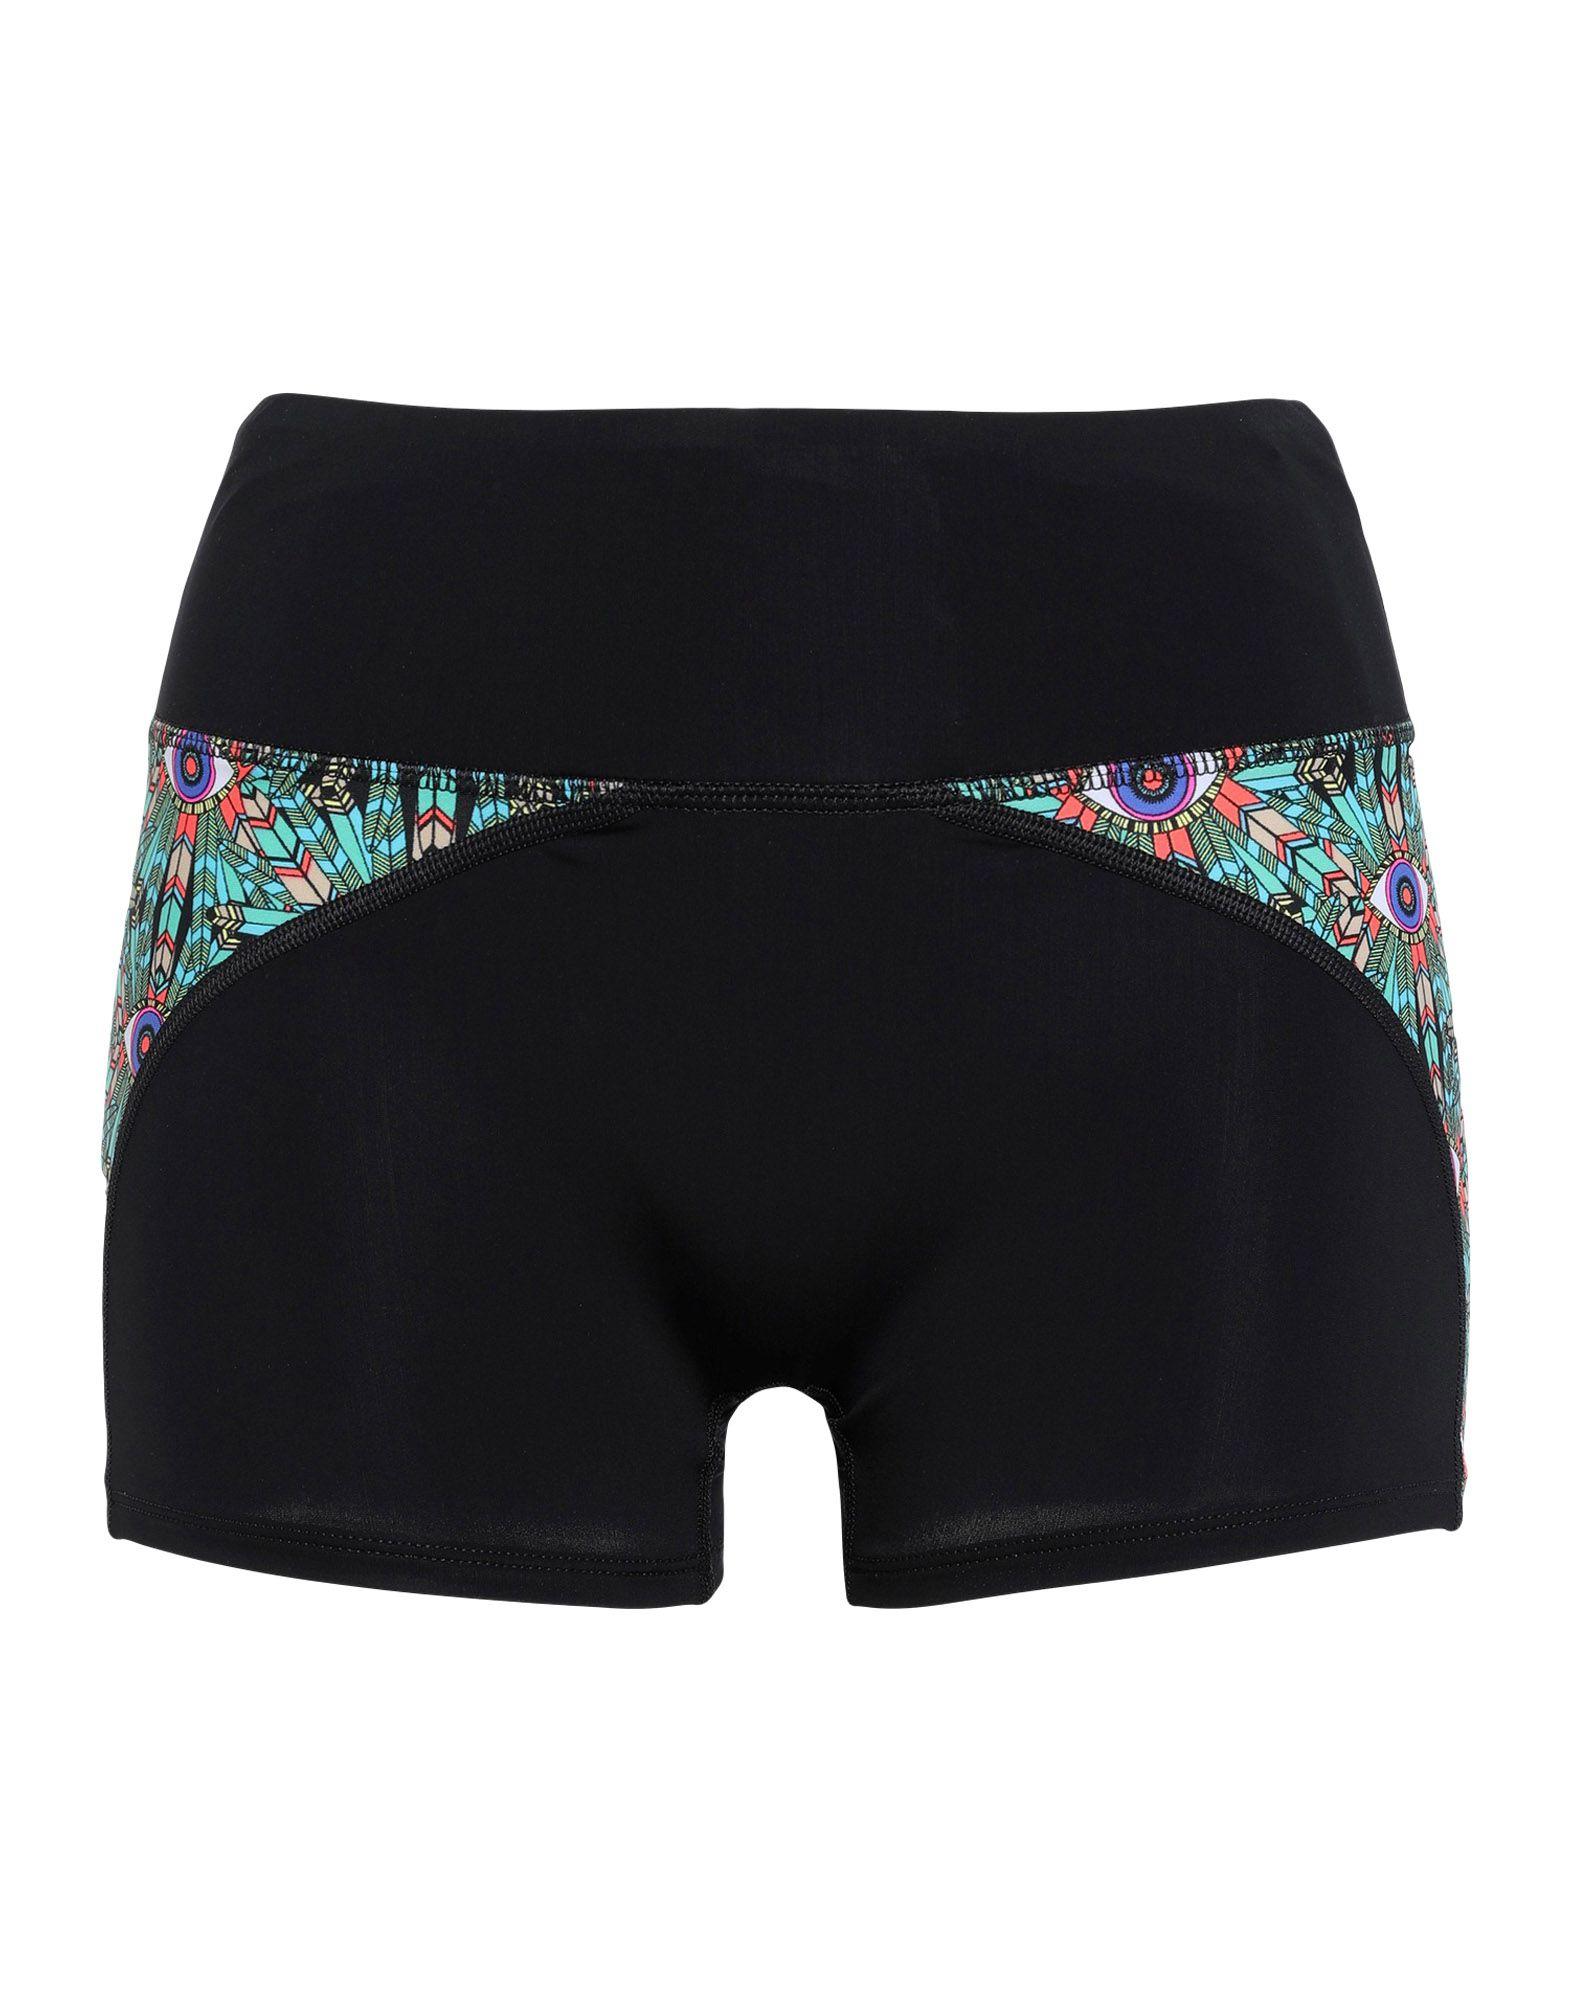 MARA HOFFMAN ACTIVE Пляжные брюки и шорты шорты пляжные женские rip curl mirage active boardshort peach